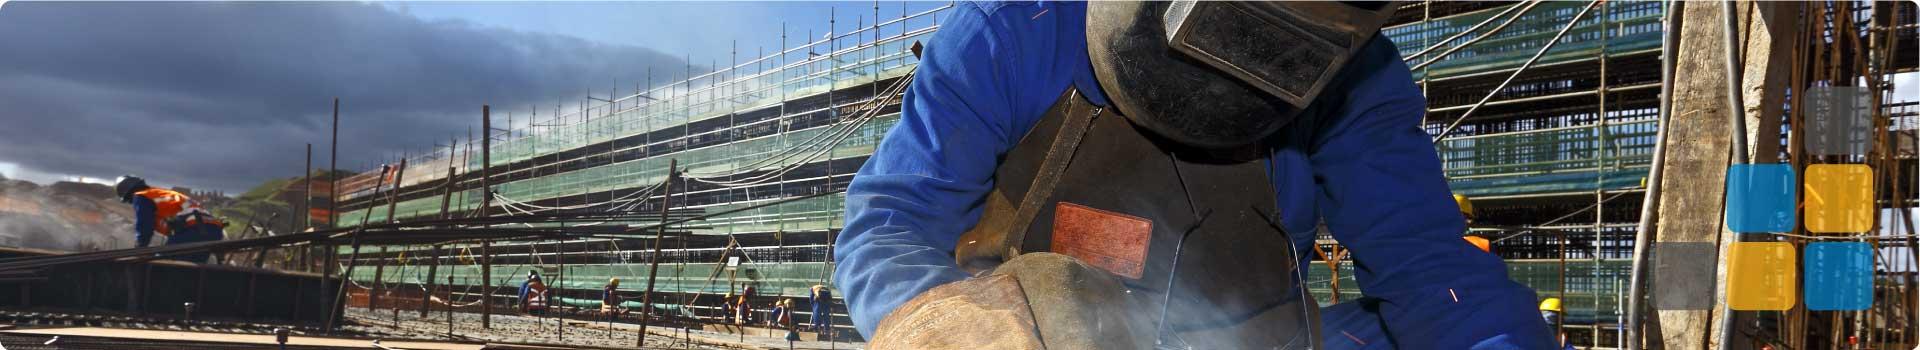 cornerstone contracting company values statement